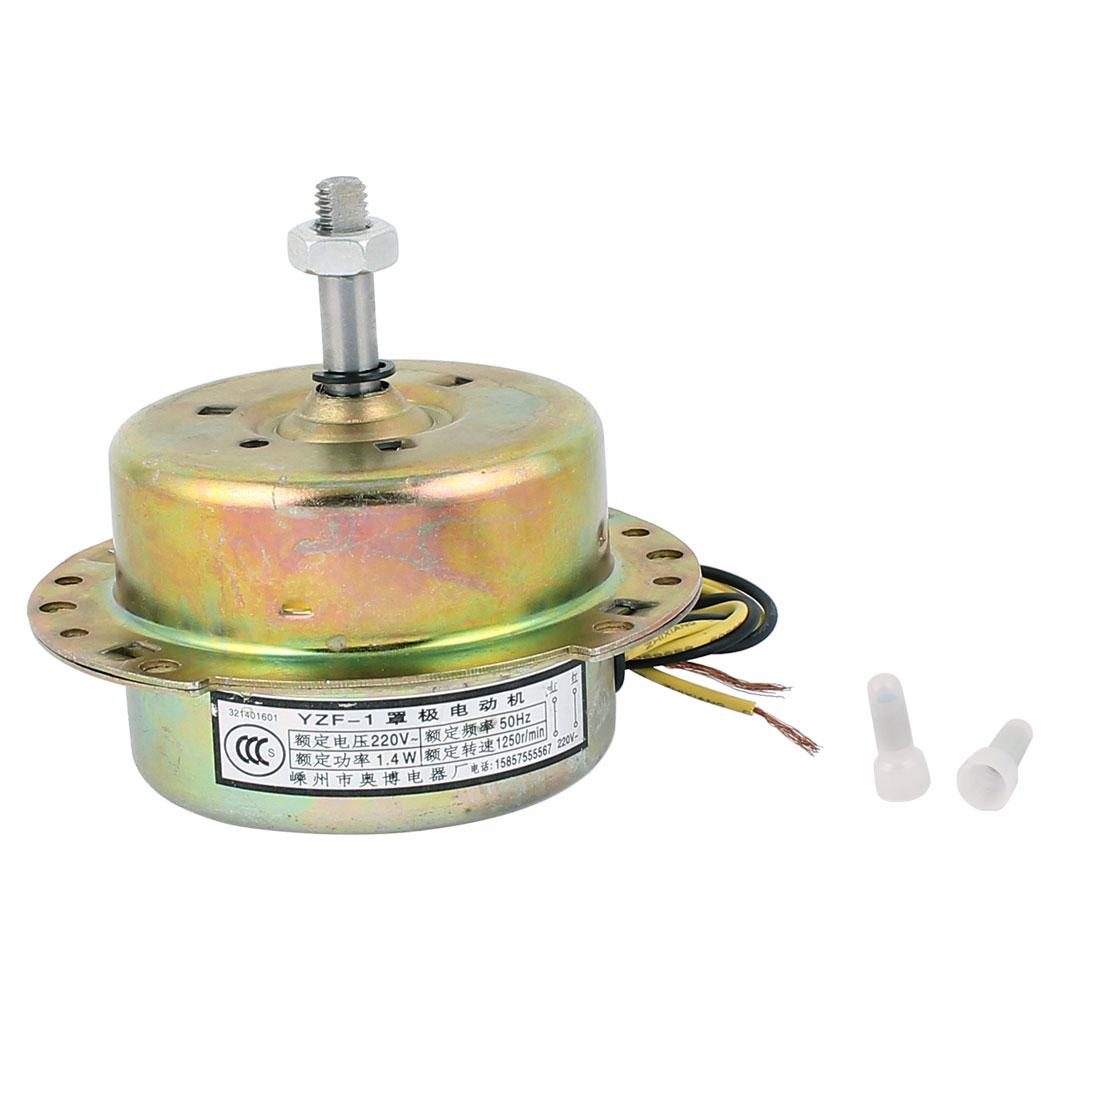 AC 220V 1.4W 1250RPM 8mmx30mm Reverse Rotating Electrical Ventilator Fan Motor